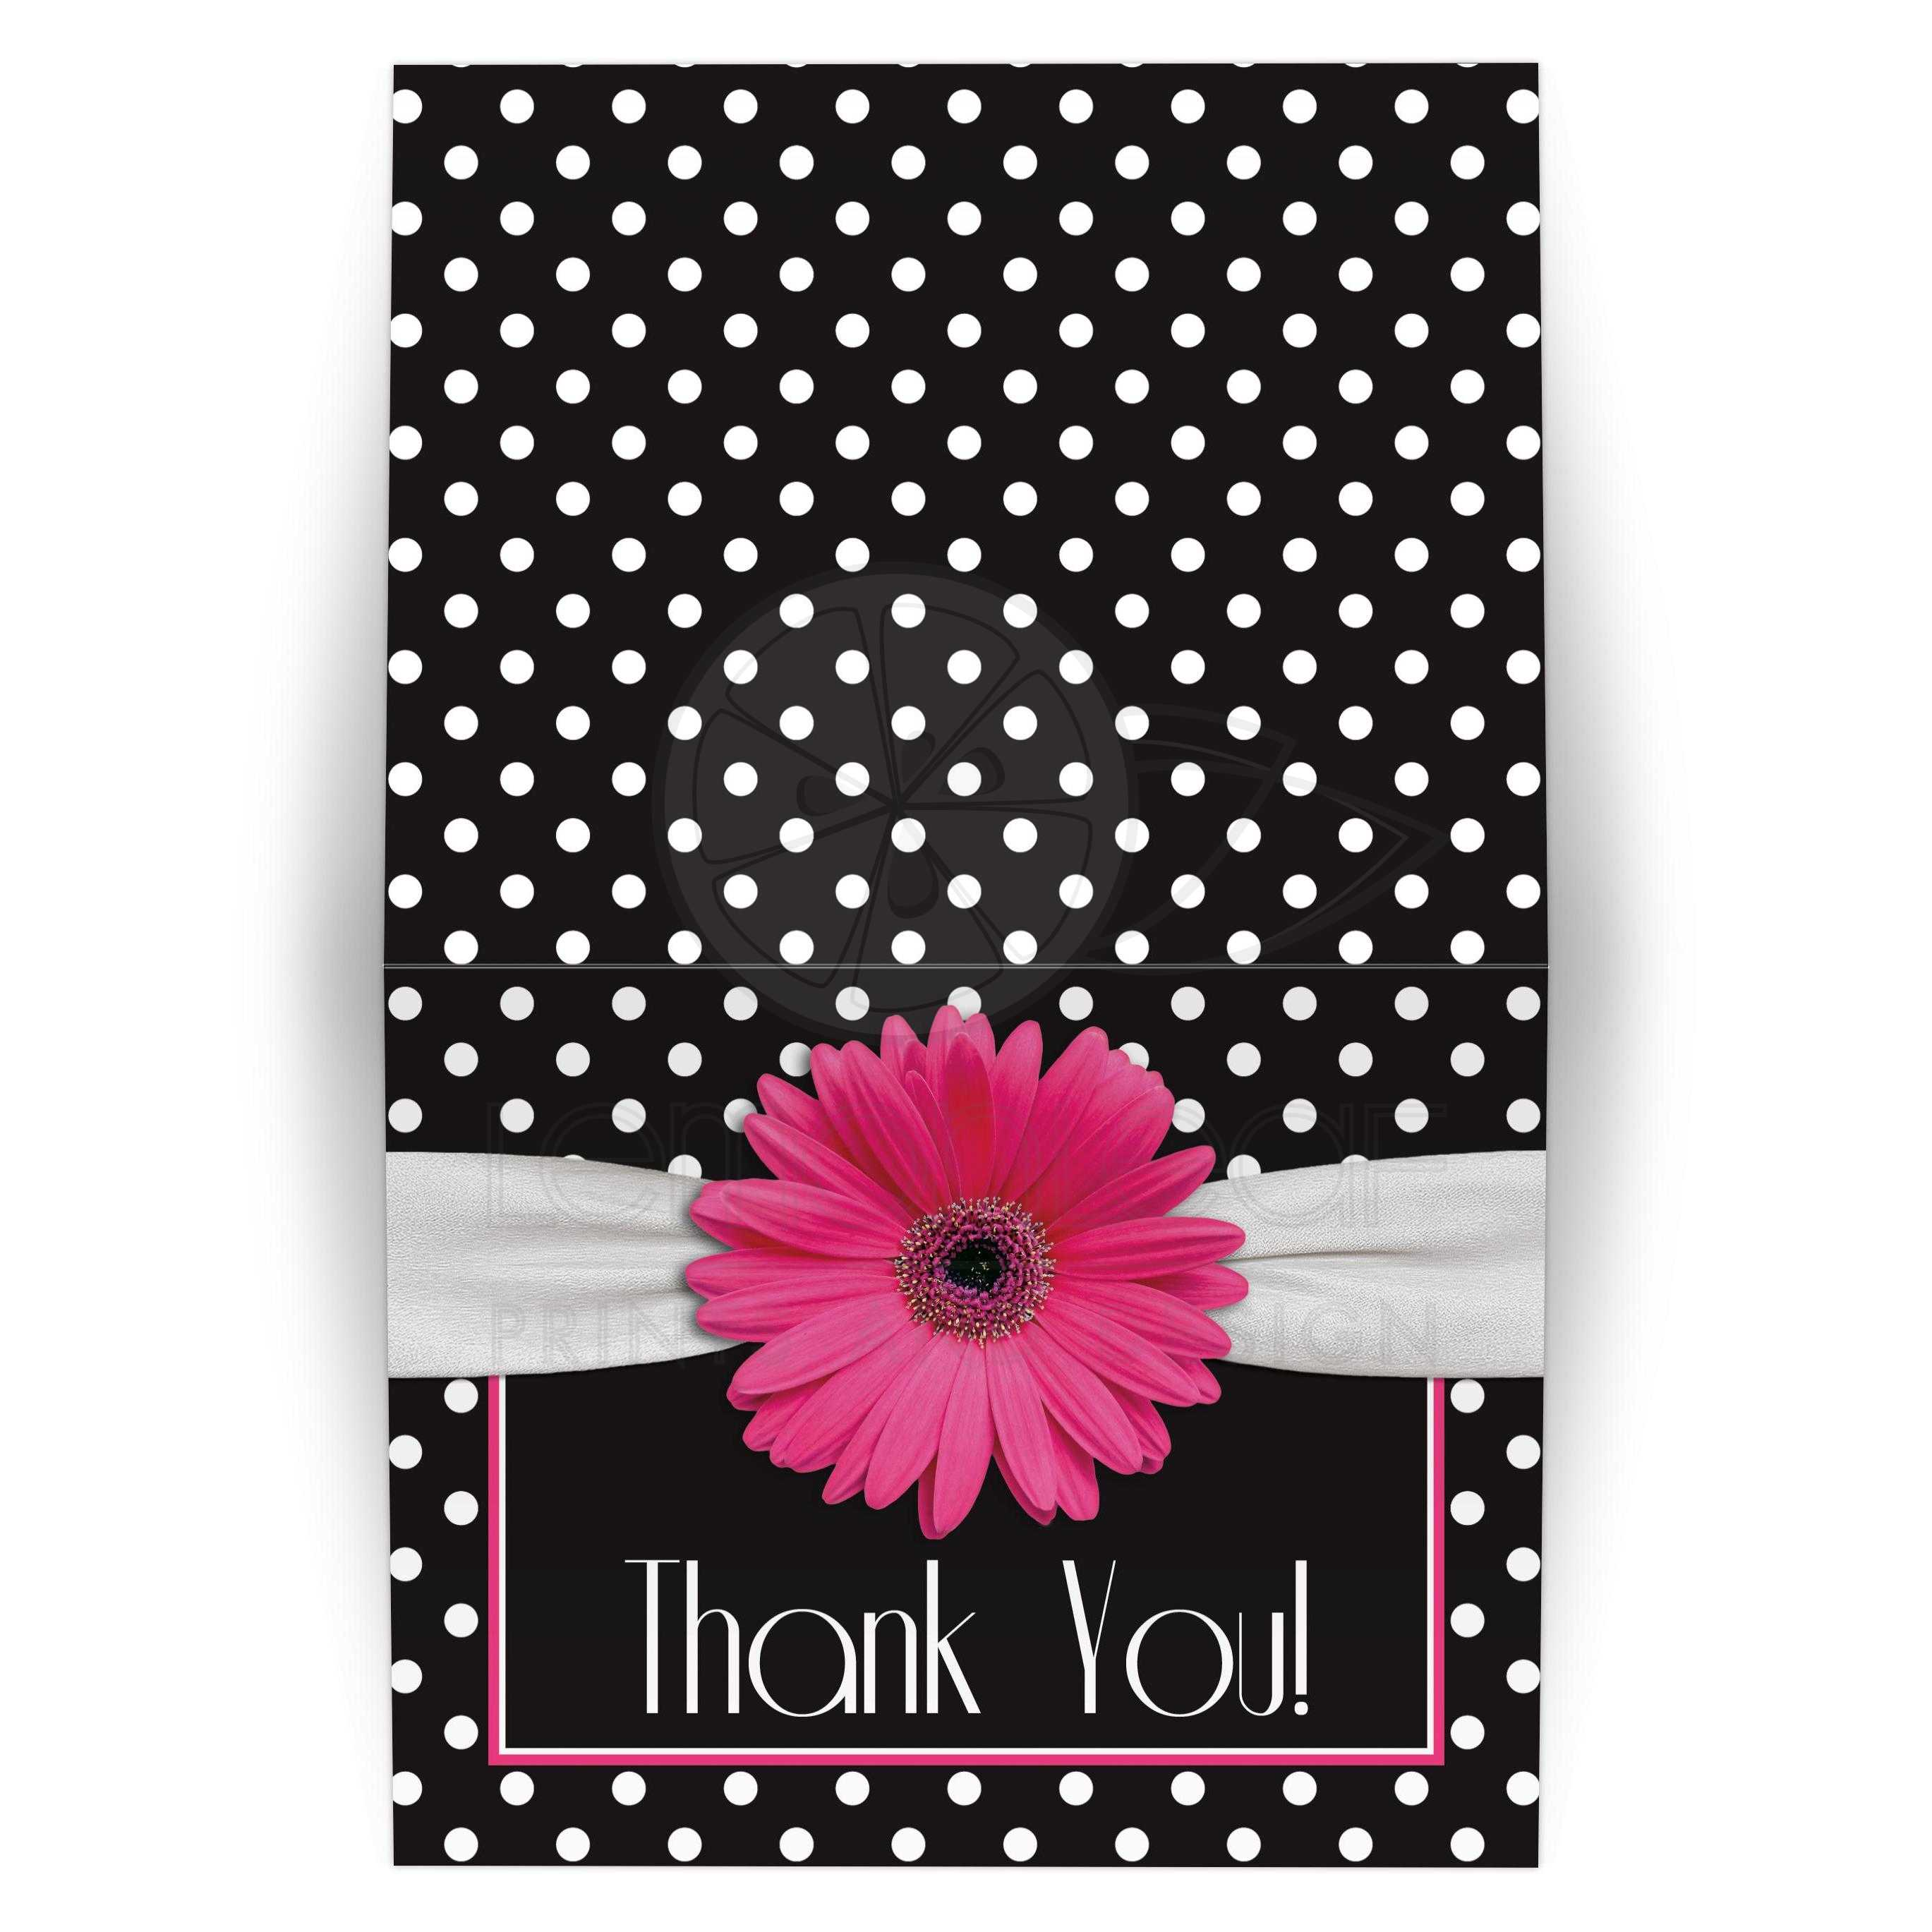 Pink Daisy Polka Dot Thank You Card Pink Black White